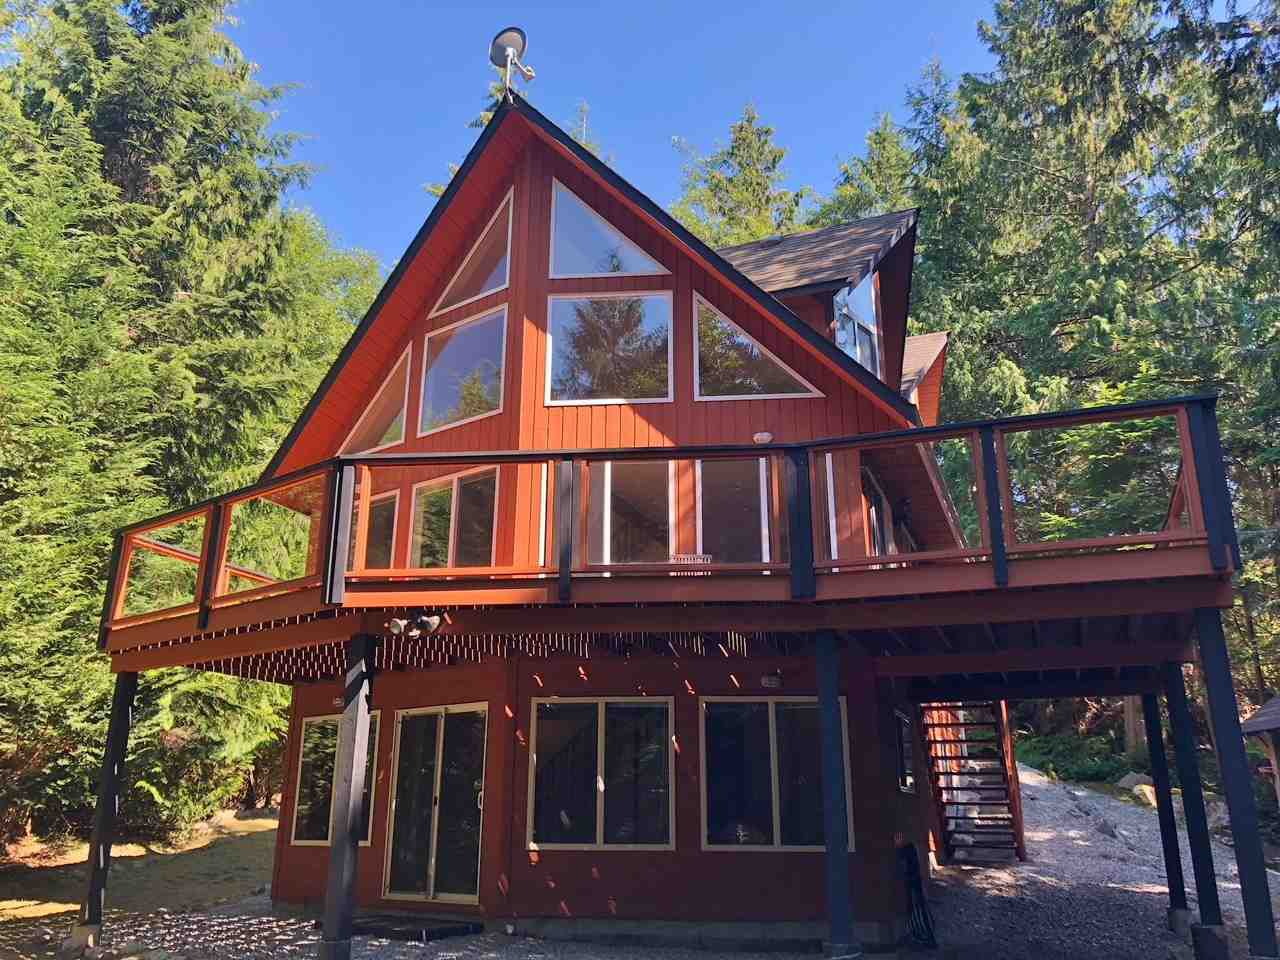 Main Photo: 5557 RILEY ROAD in Halfmoon Bay: Halfmn Bay Secret Cv Redroofs House for sale (Sunshine Coast)  : MLS®# R2344865